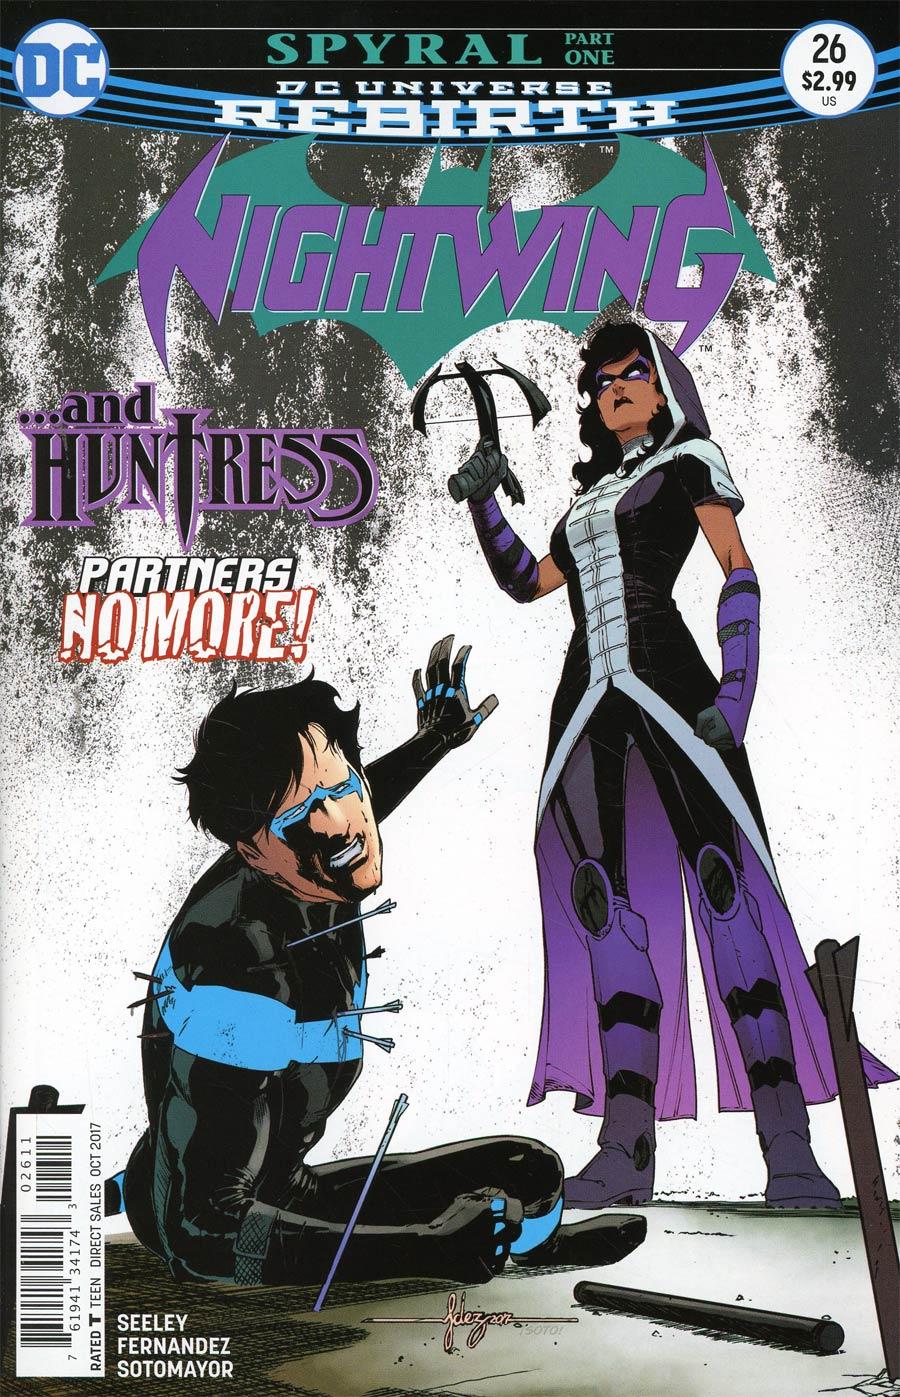 Nightwing Vol 4 #26 Cover A Regular Javier Fernandez Cover